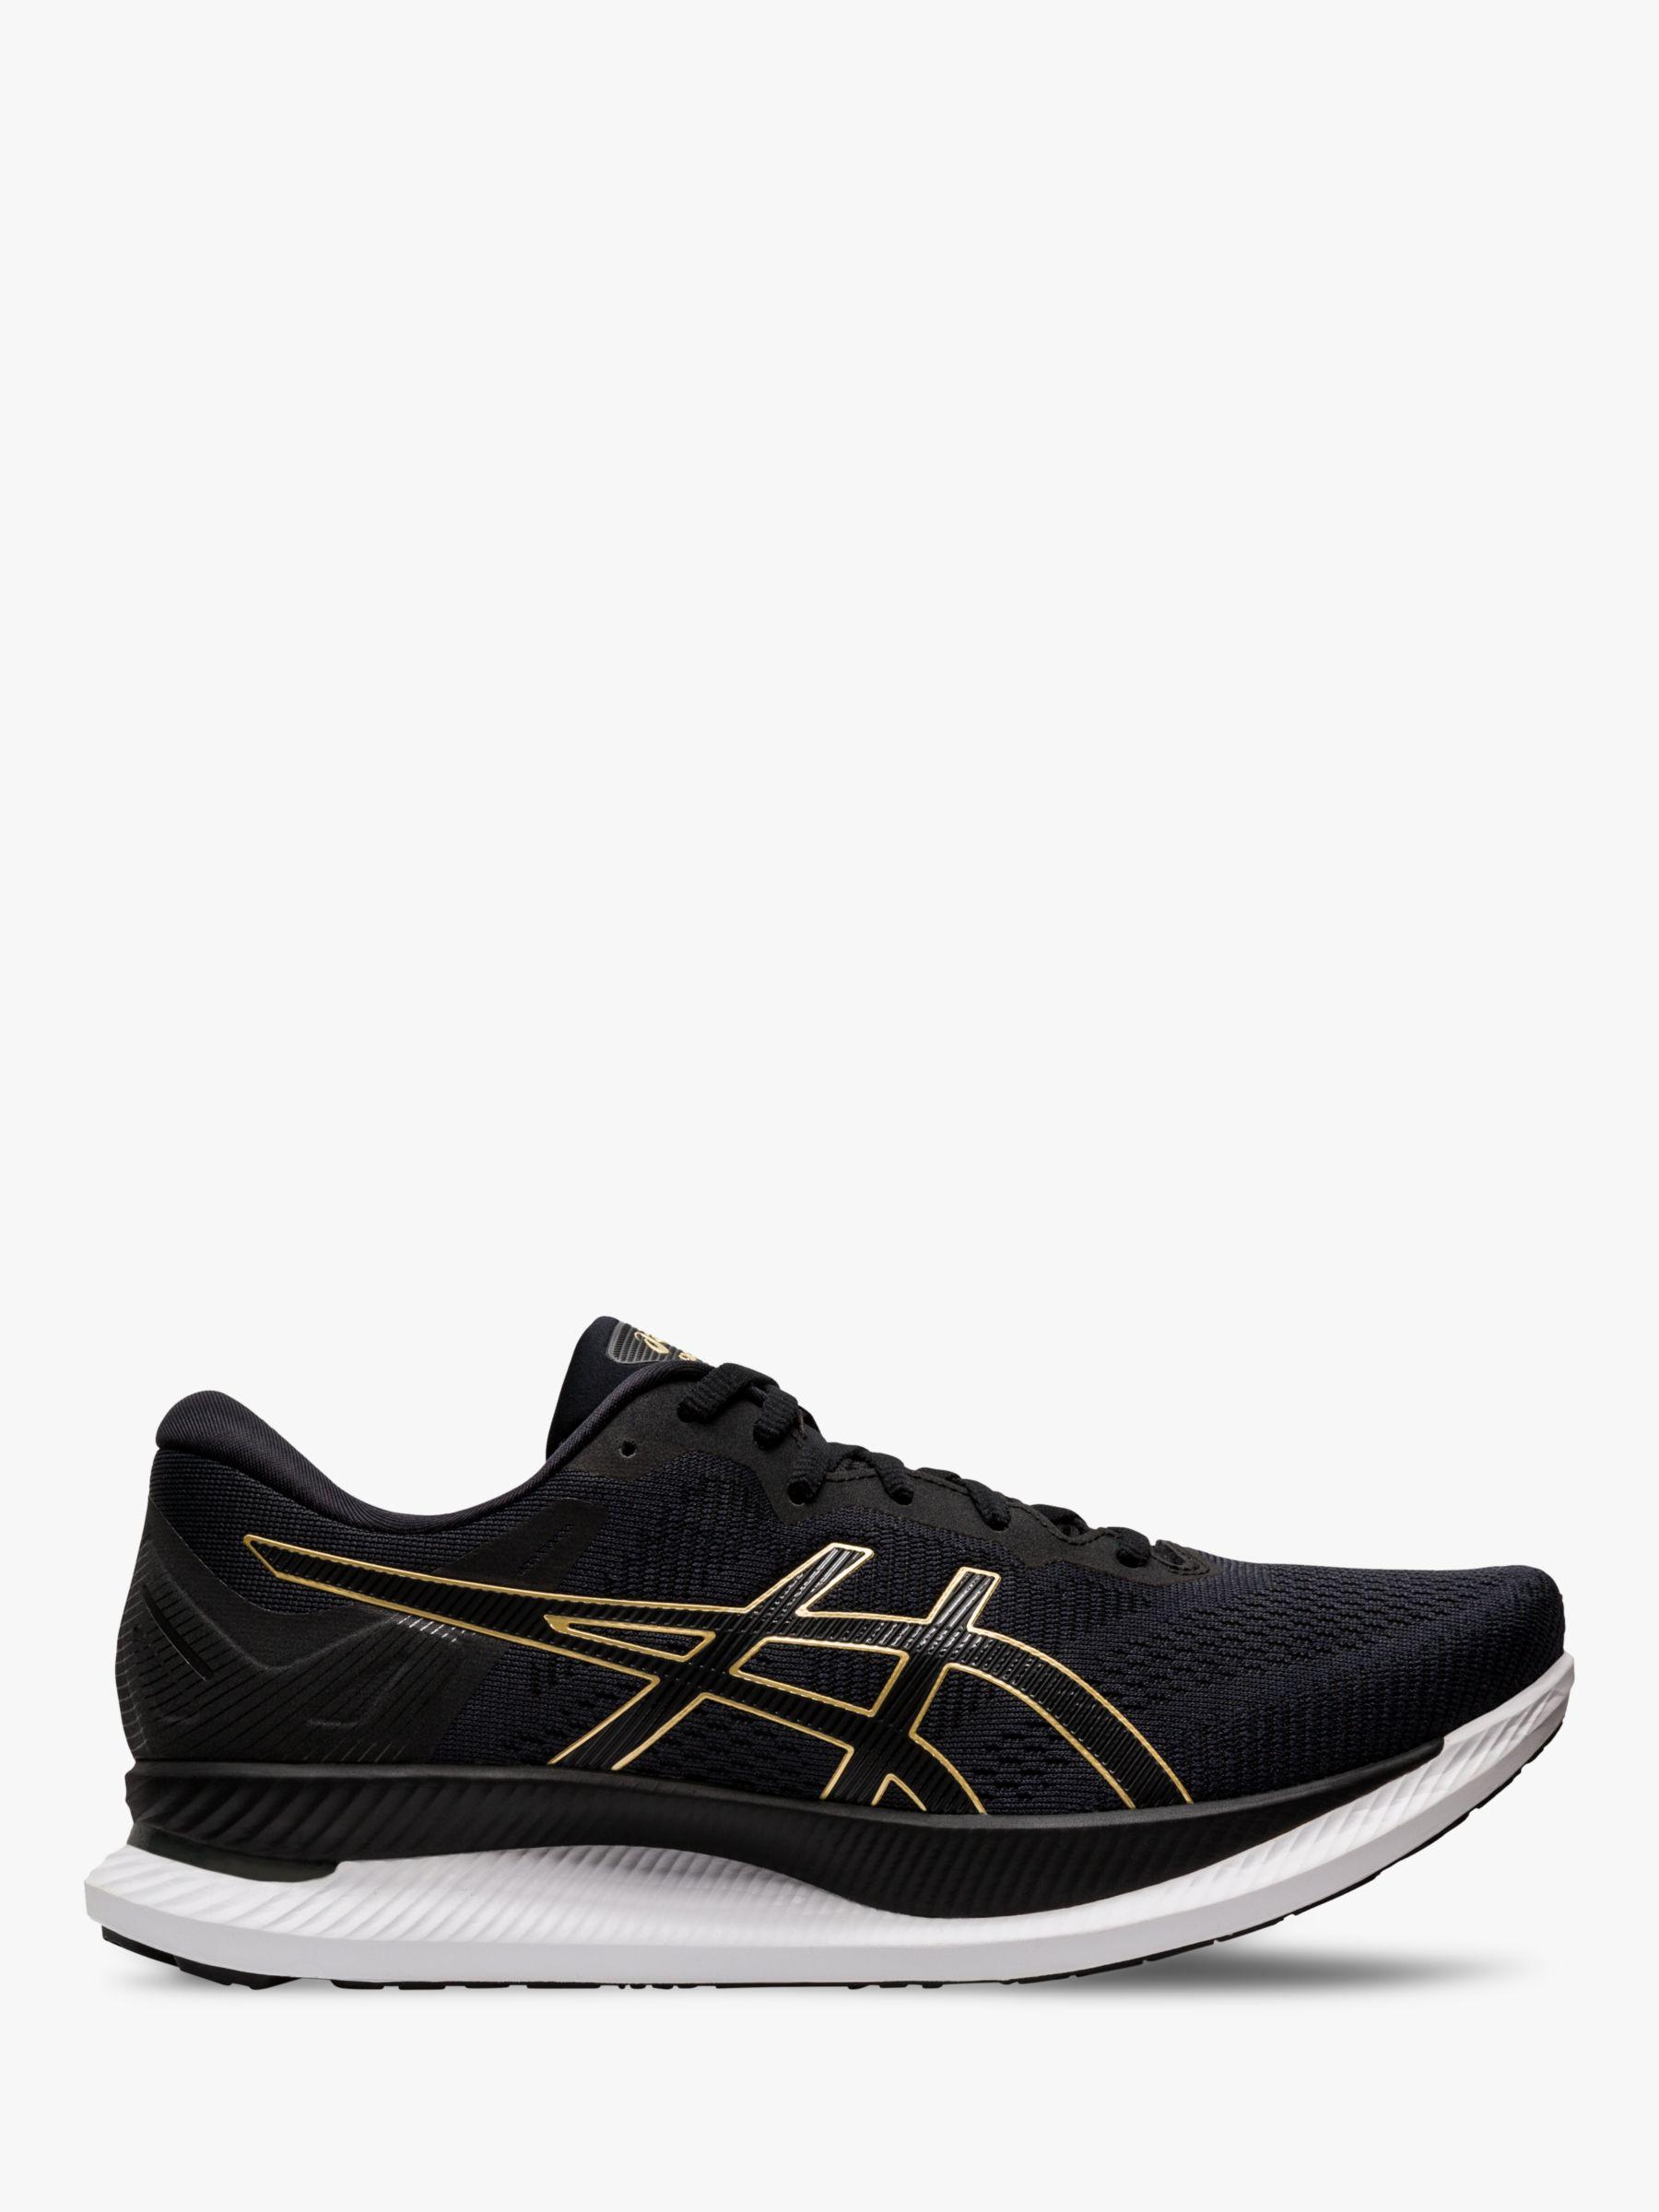 ASICS ASICS GLIDERIDE Men's Running Shoes, Black/Pure Gold